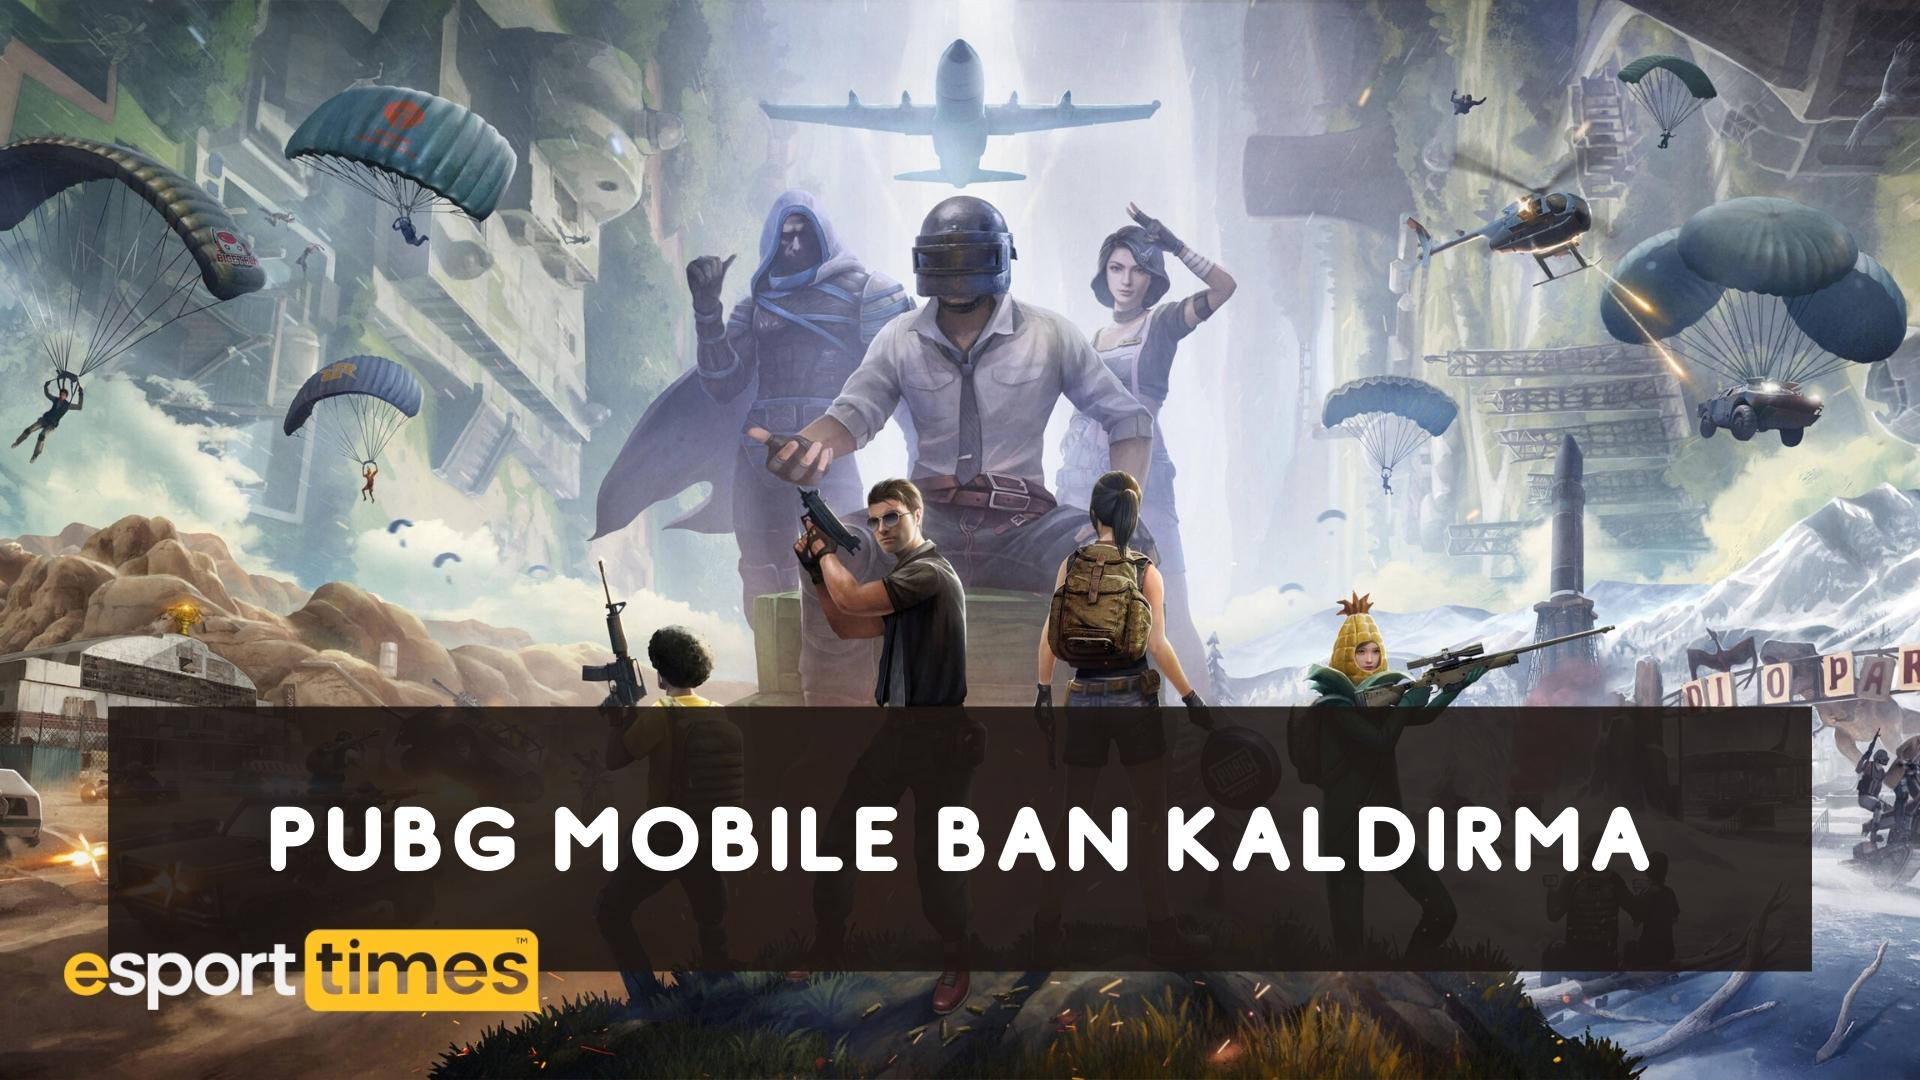 Pubg Mobile Ban Kaldırma esportimes